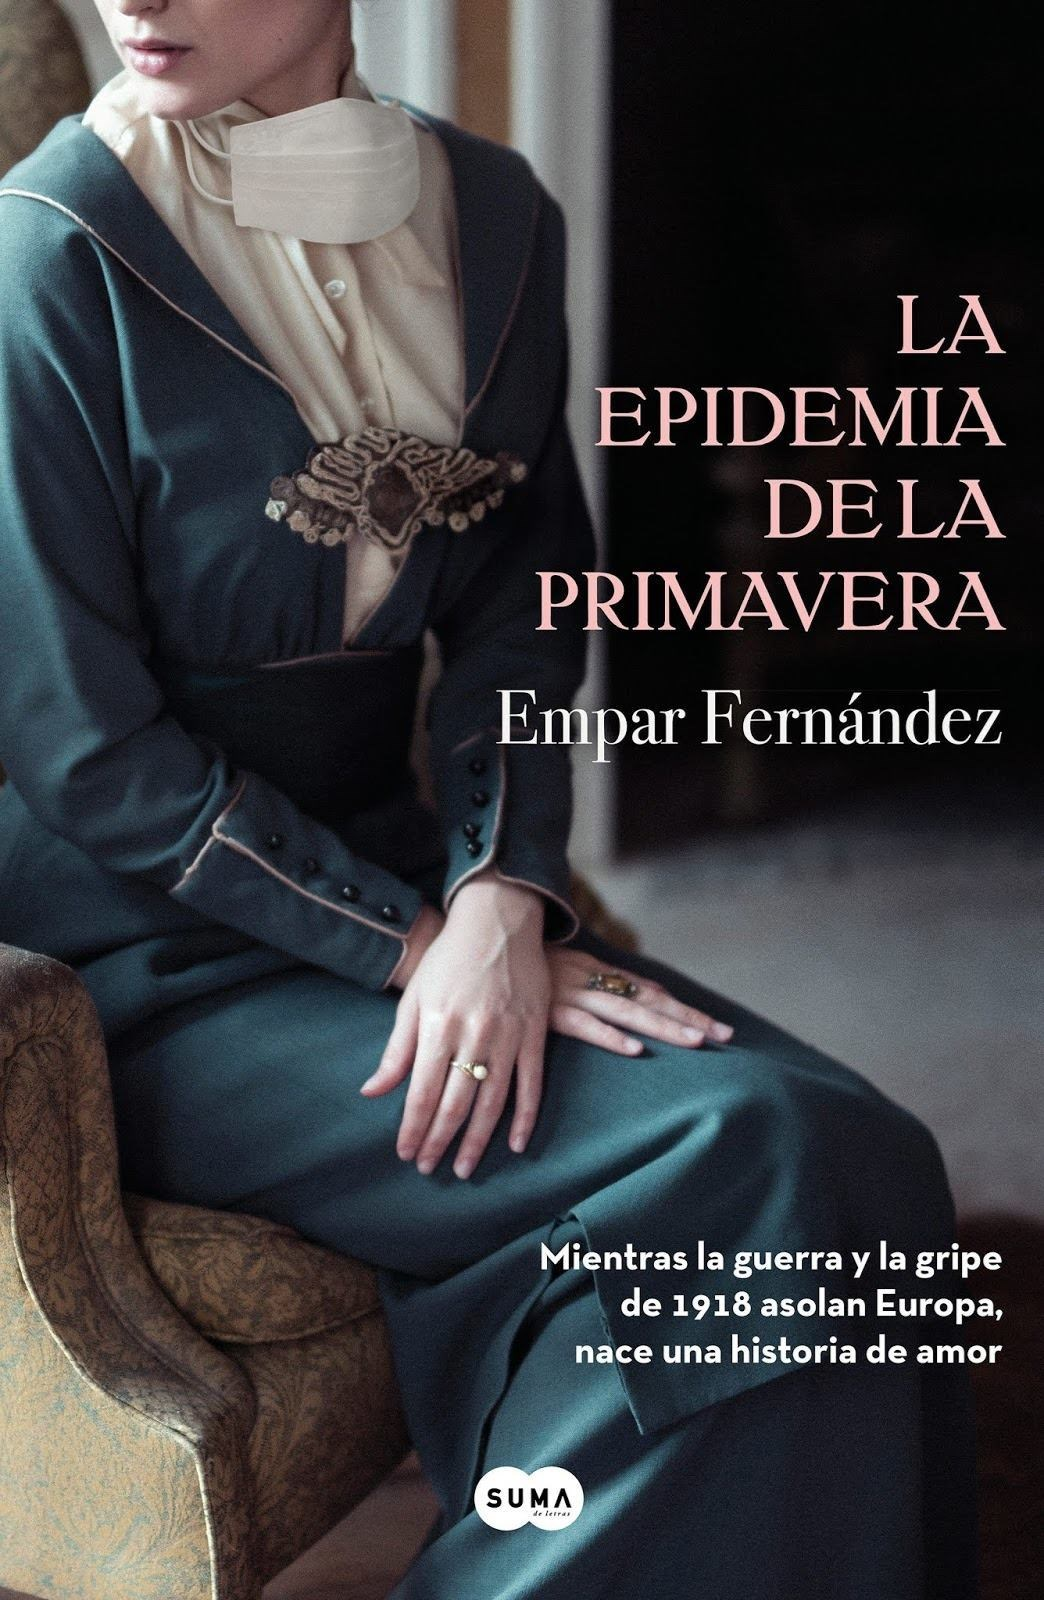 'La epidemia de la primavera' · Empar Fernández